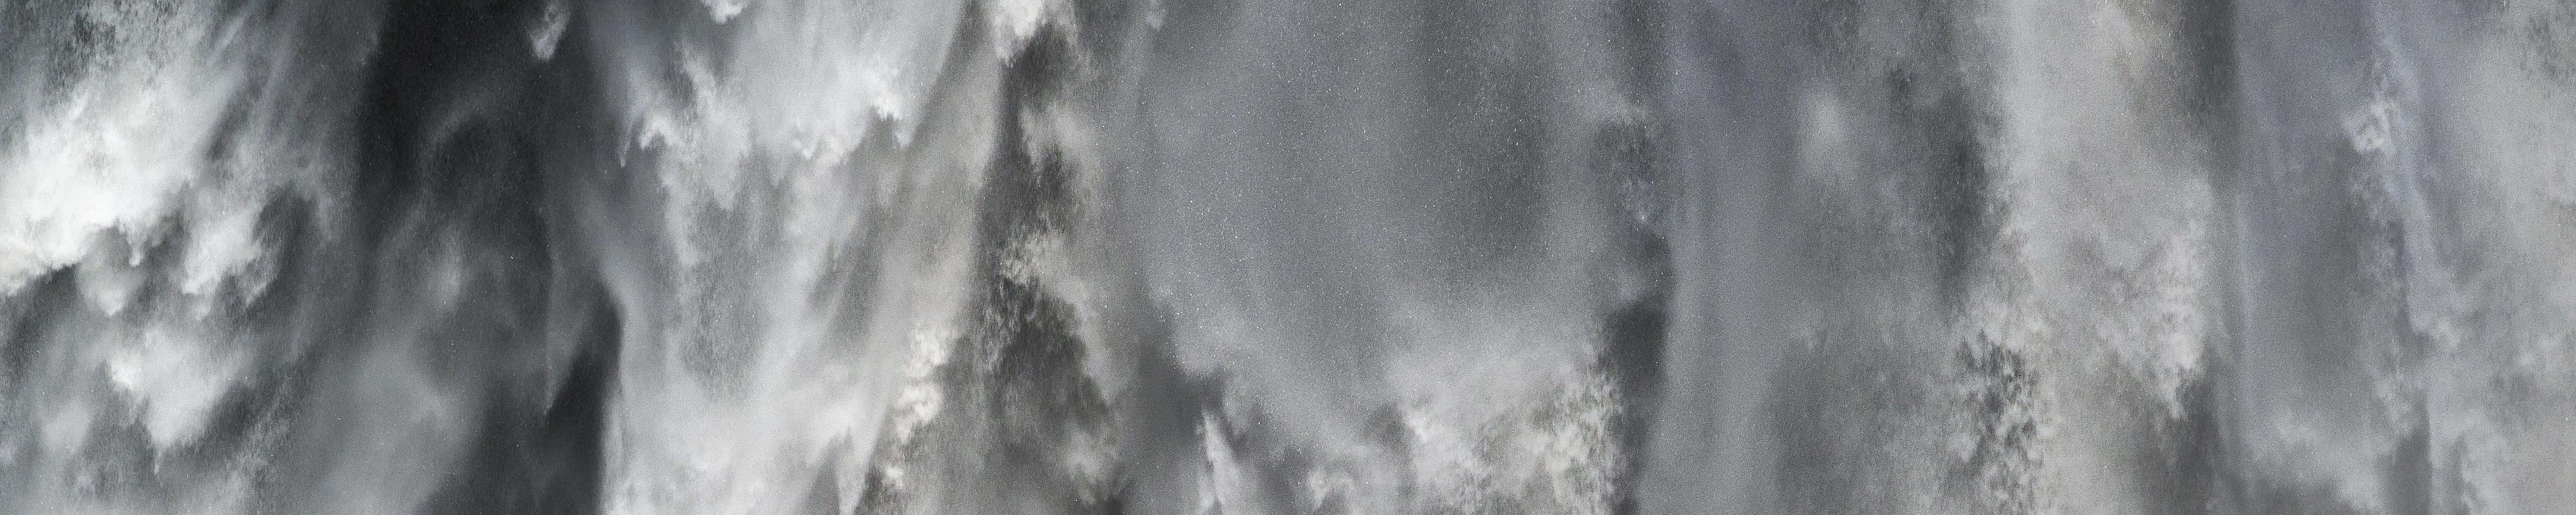 Waterfall banner-1